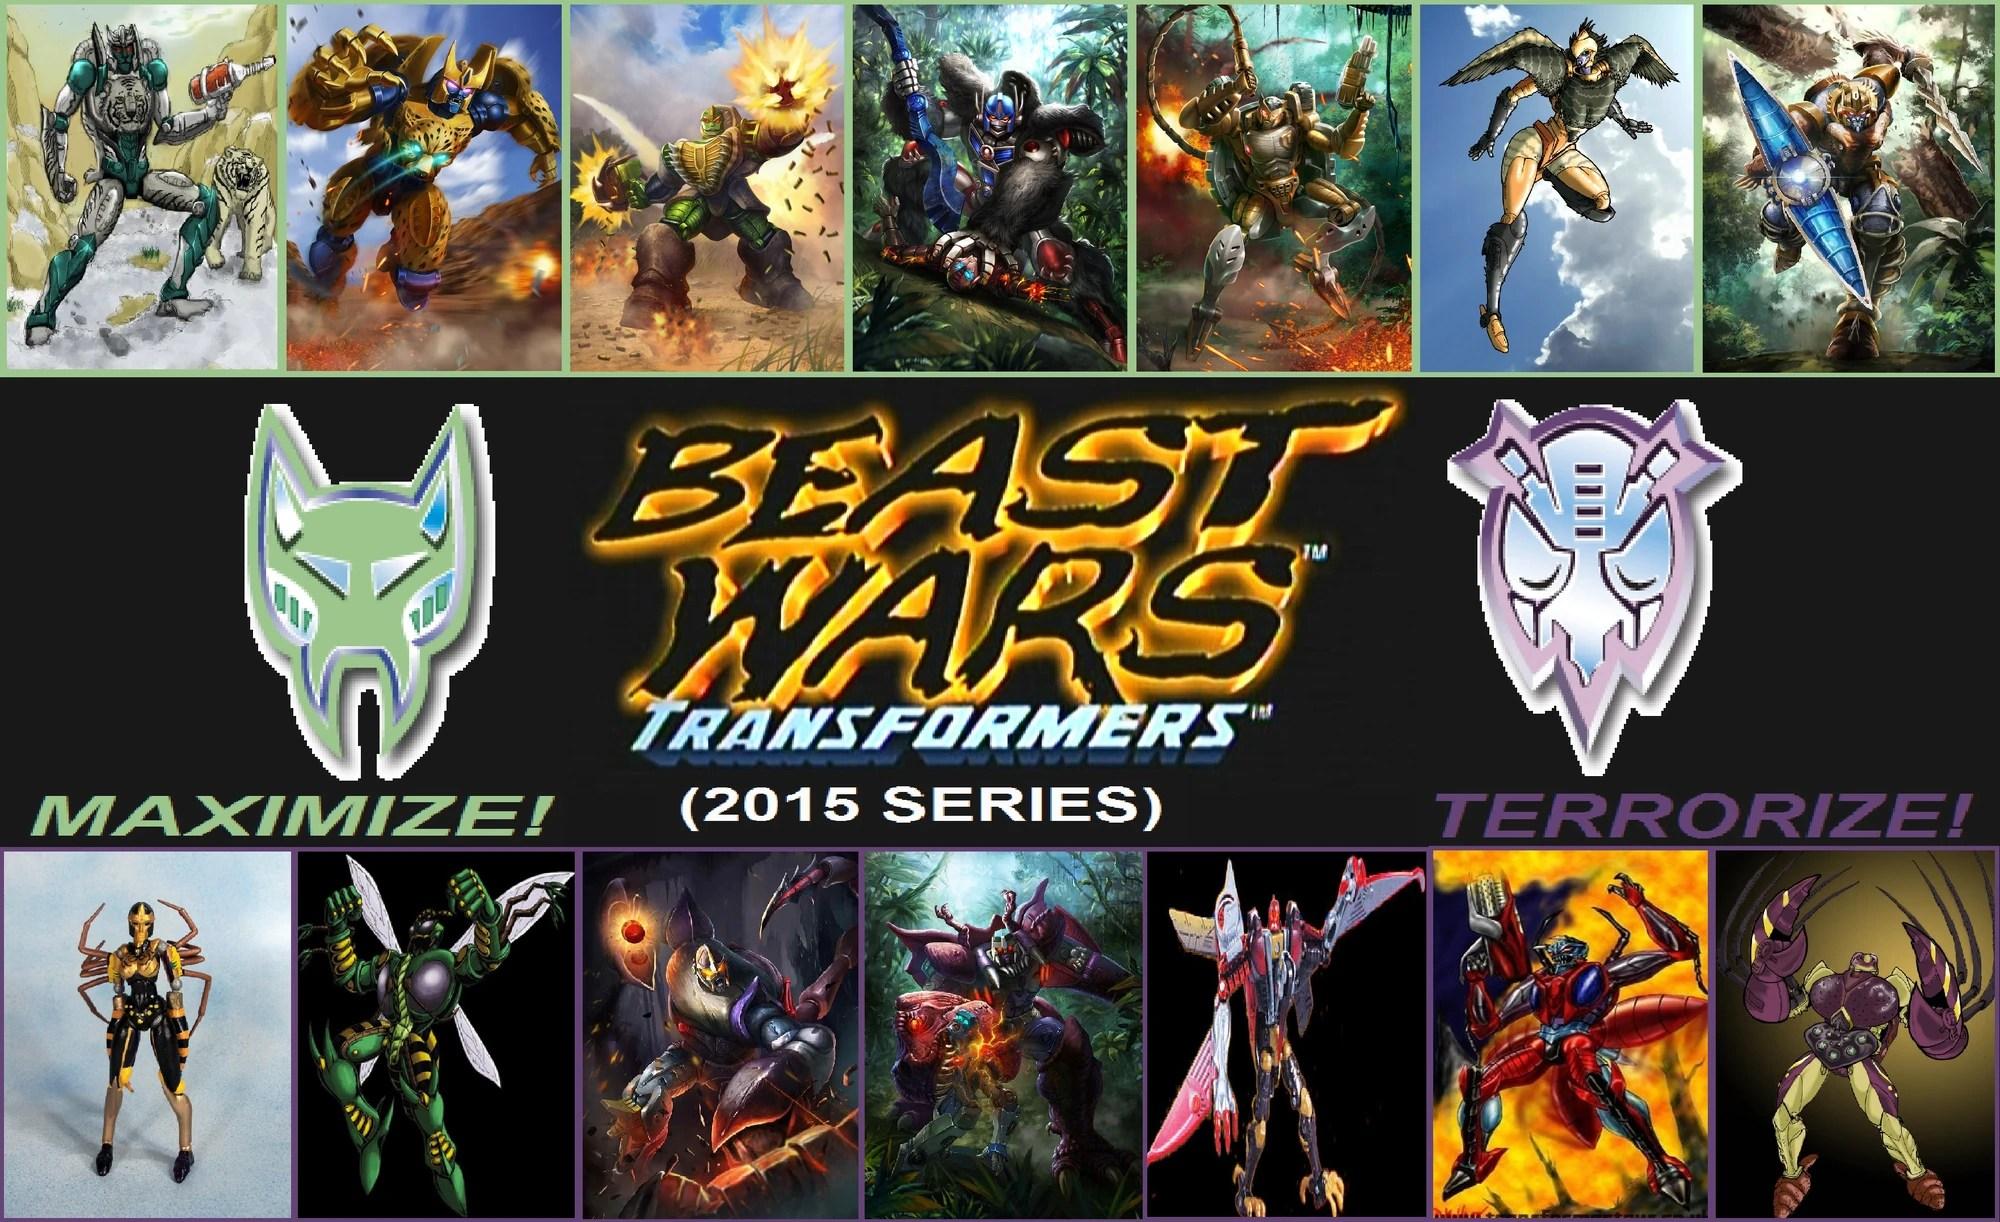 Beast Wars Transformers 2015 Series Idea Wiki